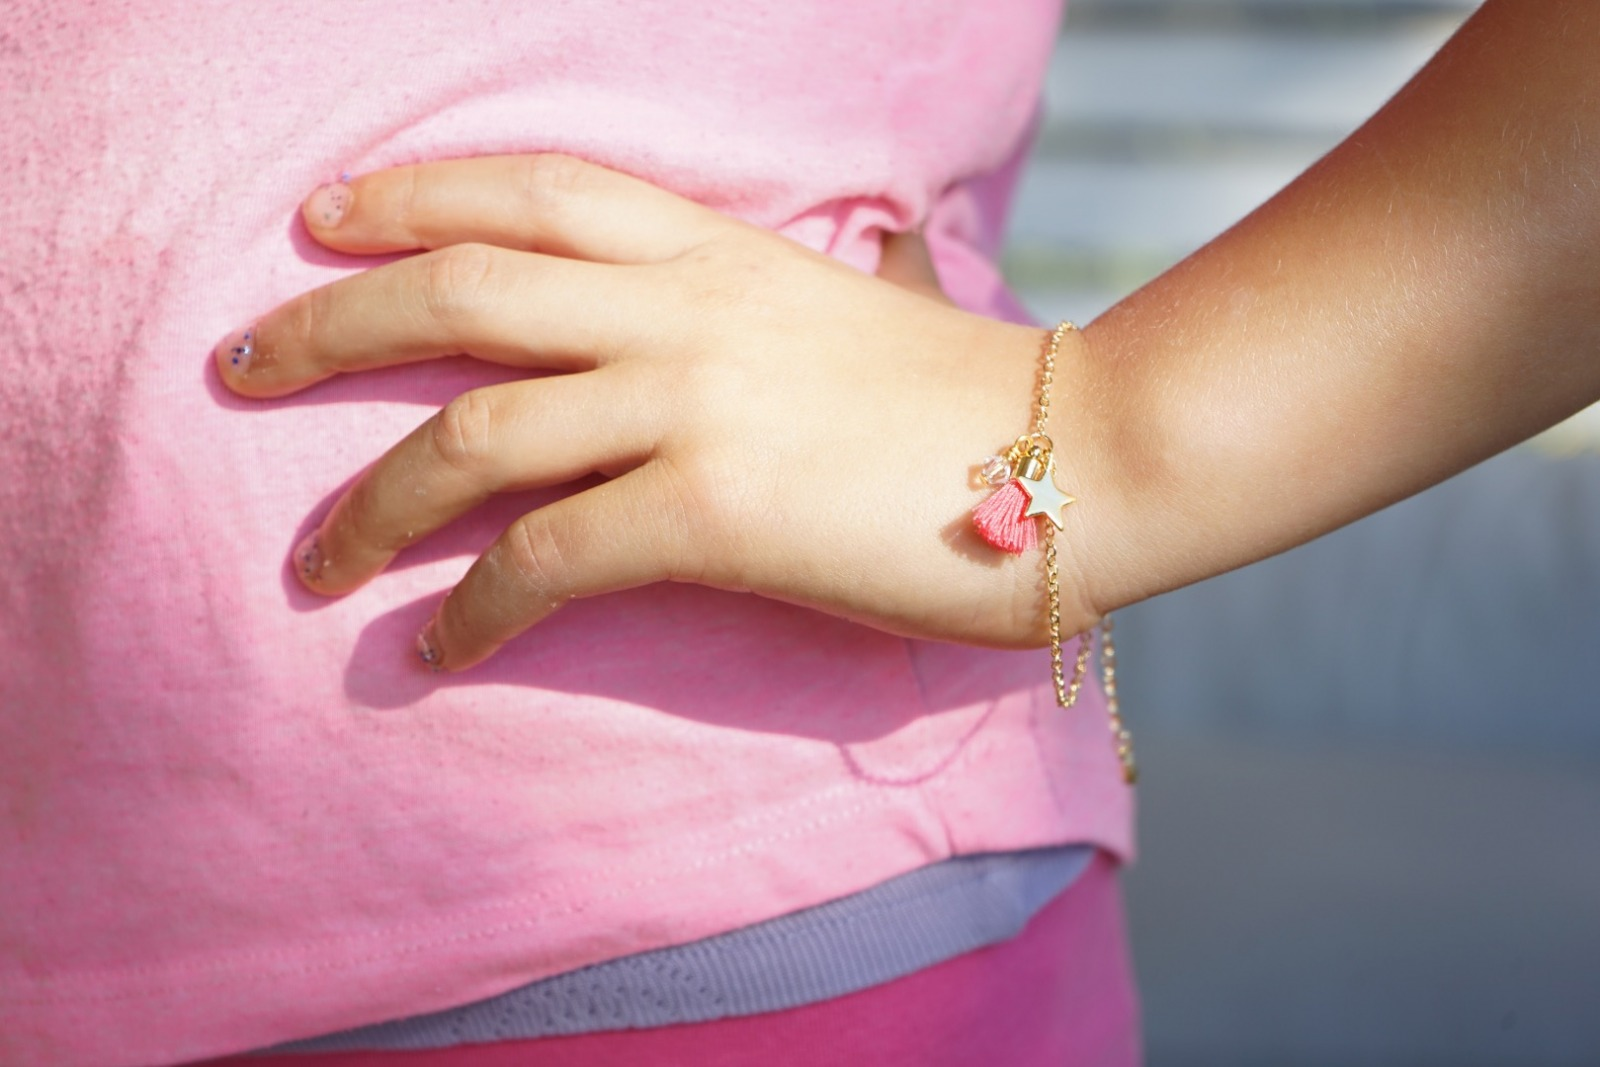 Set Kette Armband Gold mit Glitzeranhänger - 5